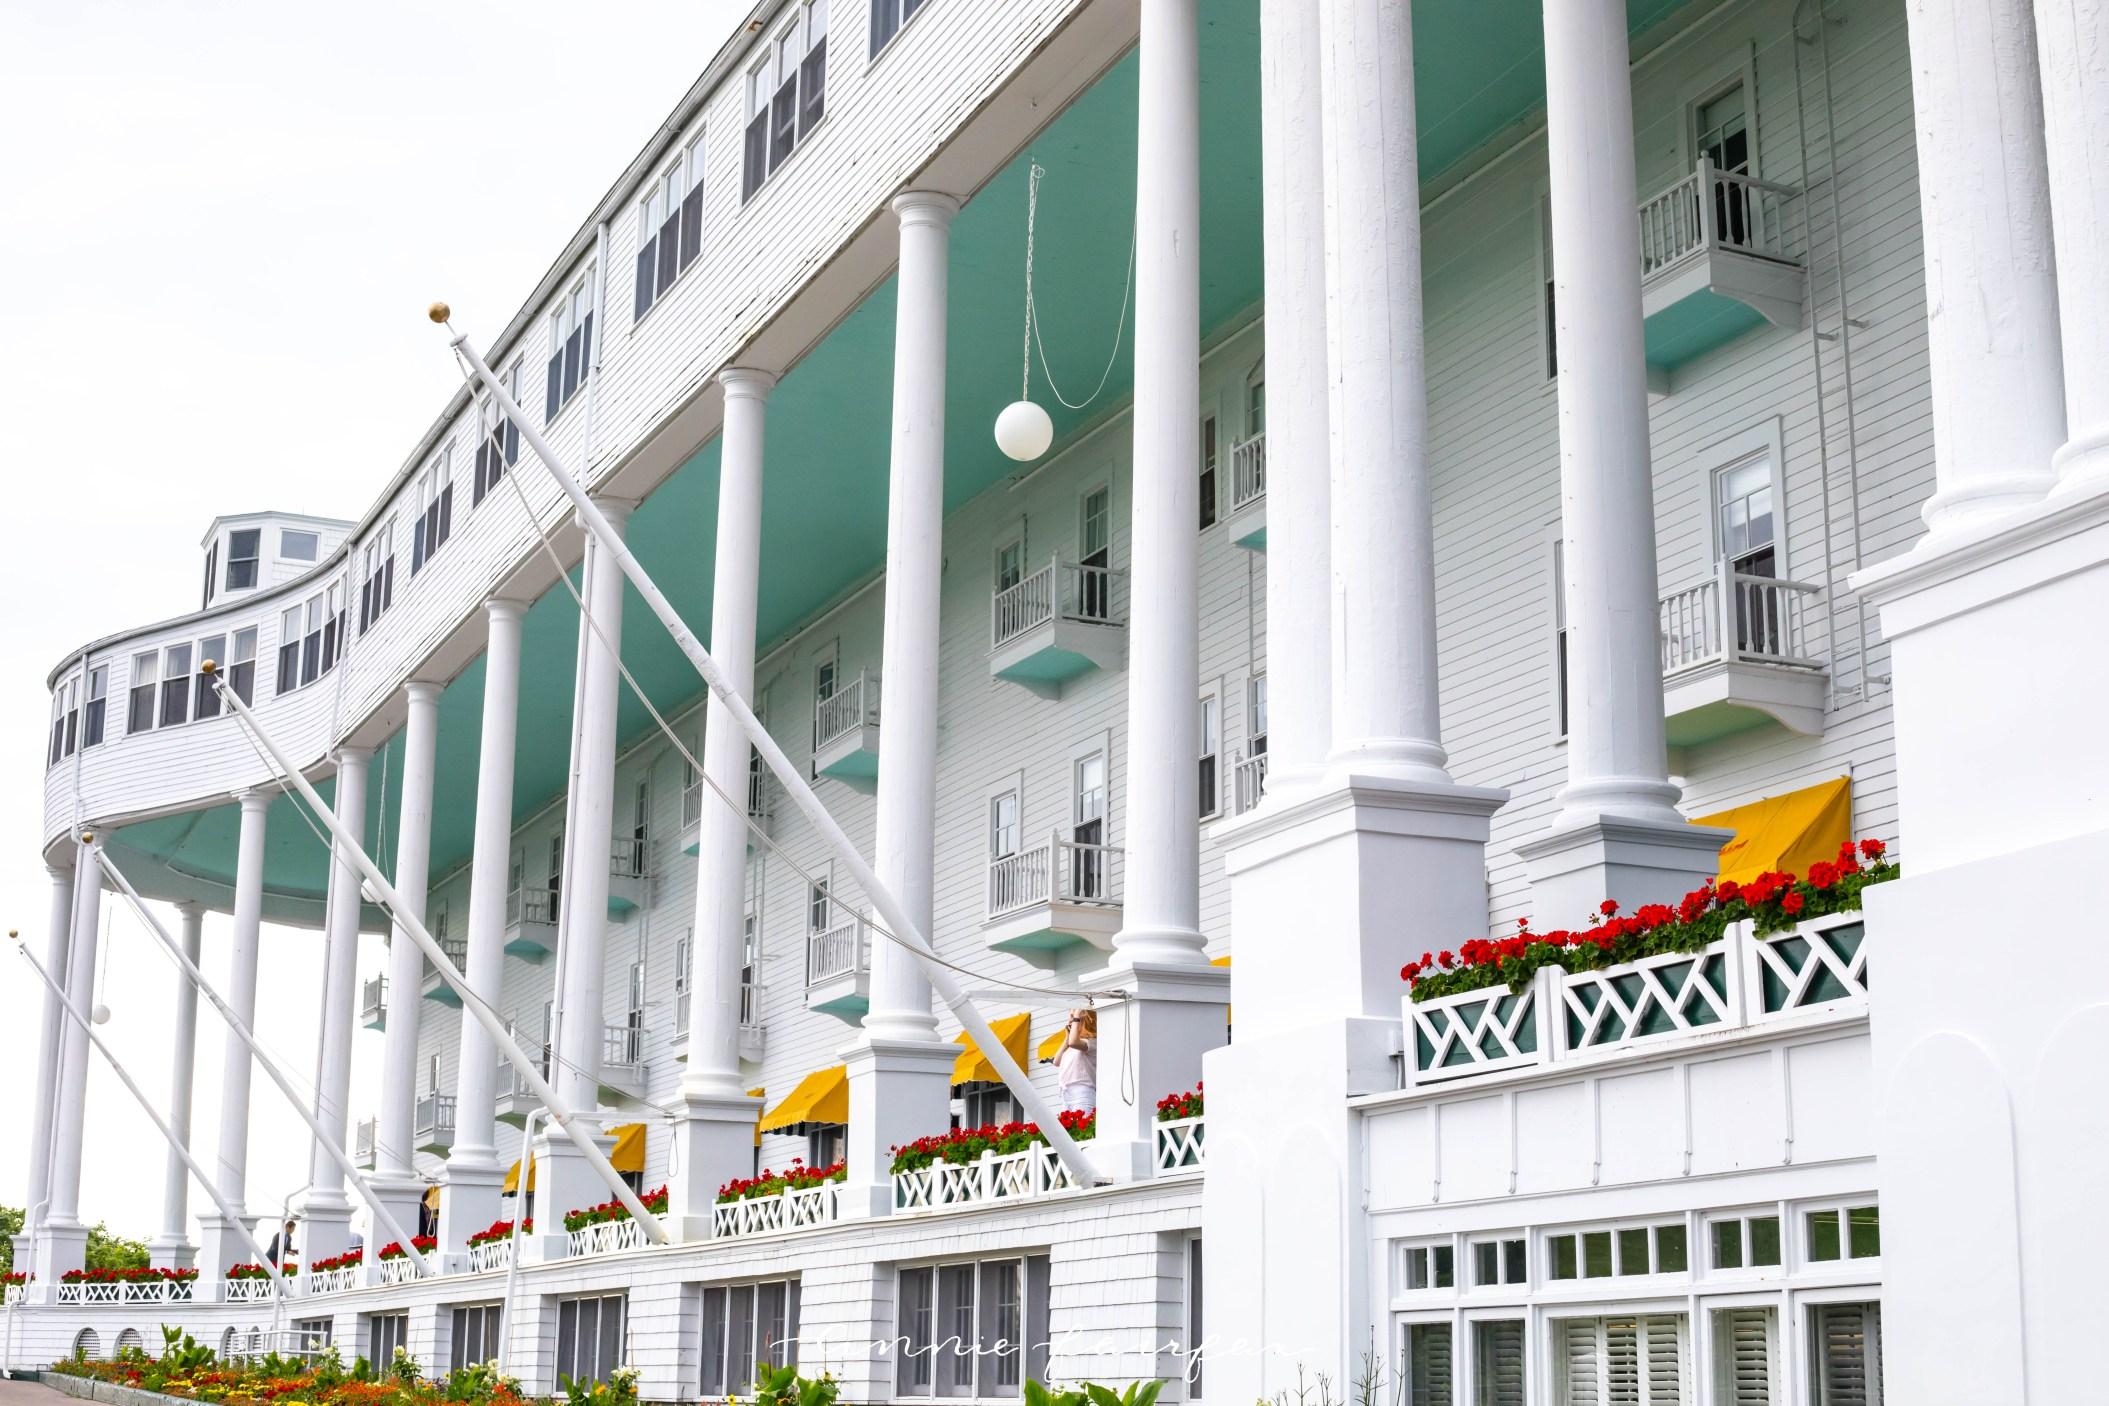 Word's Longest Porch Grand Hotel Mackinac Island Michigan inside Look Tour